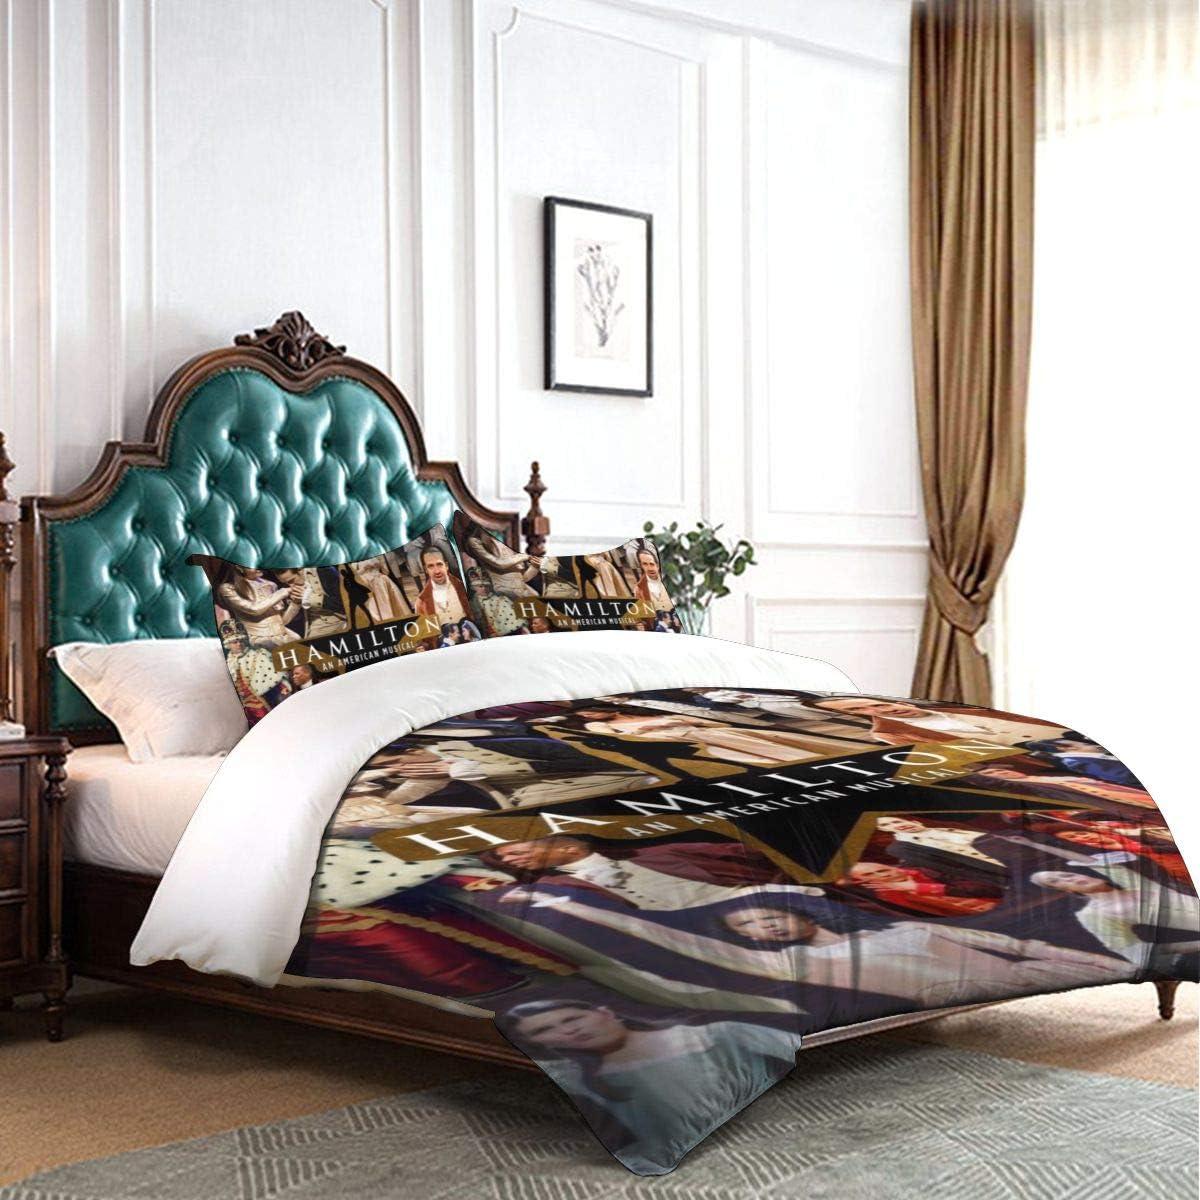 "IIIUUbhswb Hamilton 3-Piece Bedding Set 86""X70"" Soft Printed Microfiber Comforter Cover with Zipper Closure: Home & Kitchen"